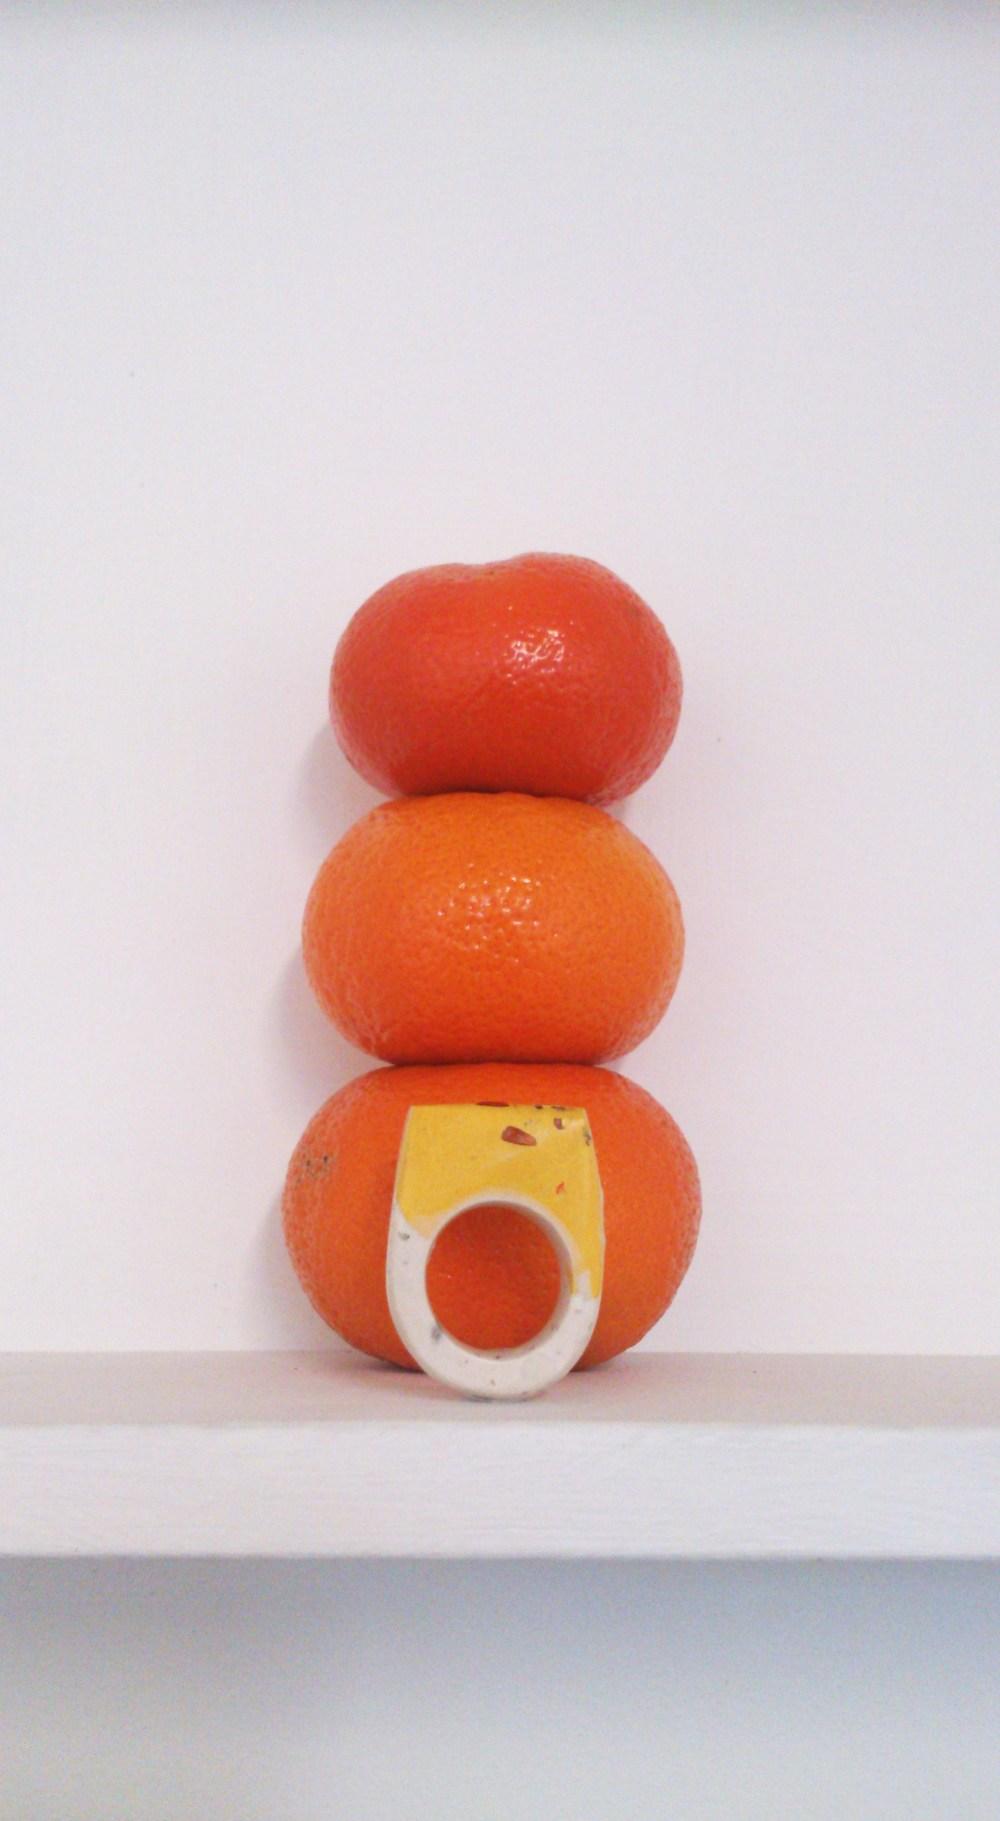 jade mellor hewn ring white orange carnelian clementines.jpg